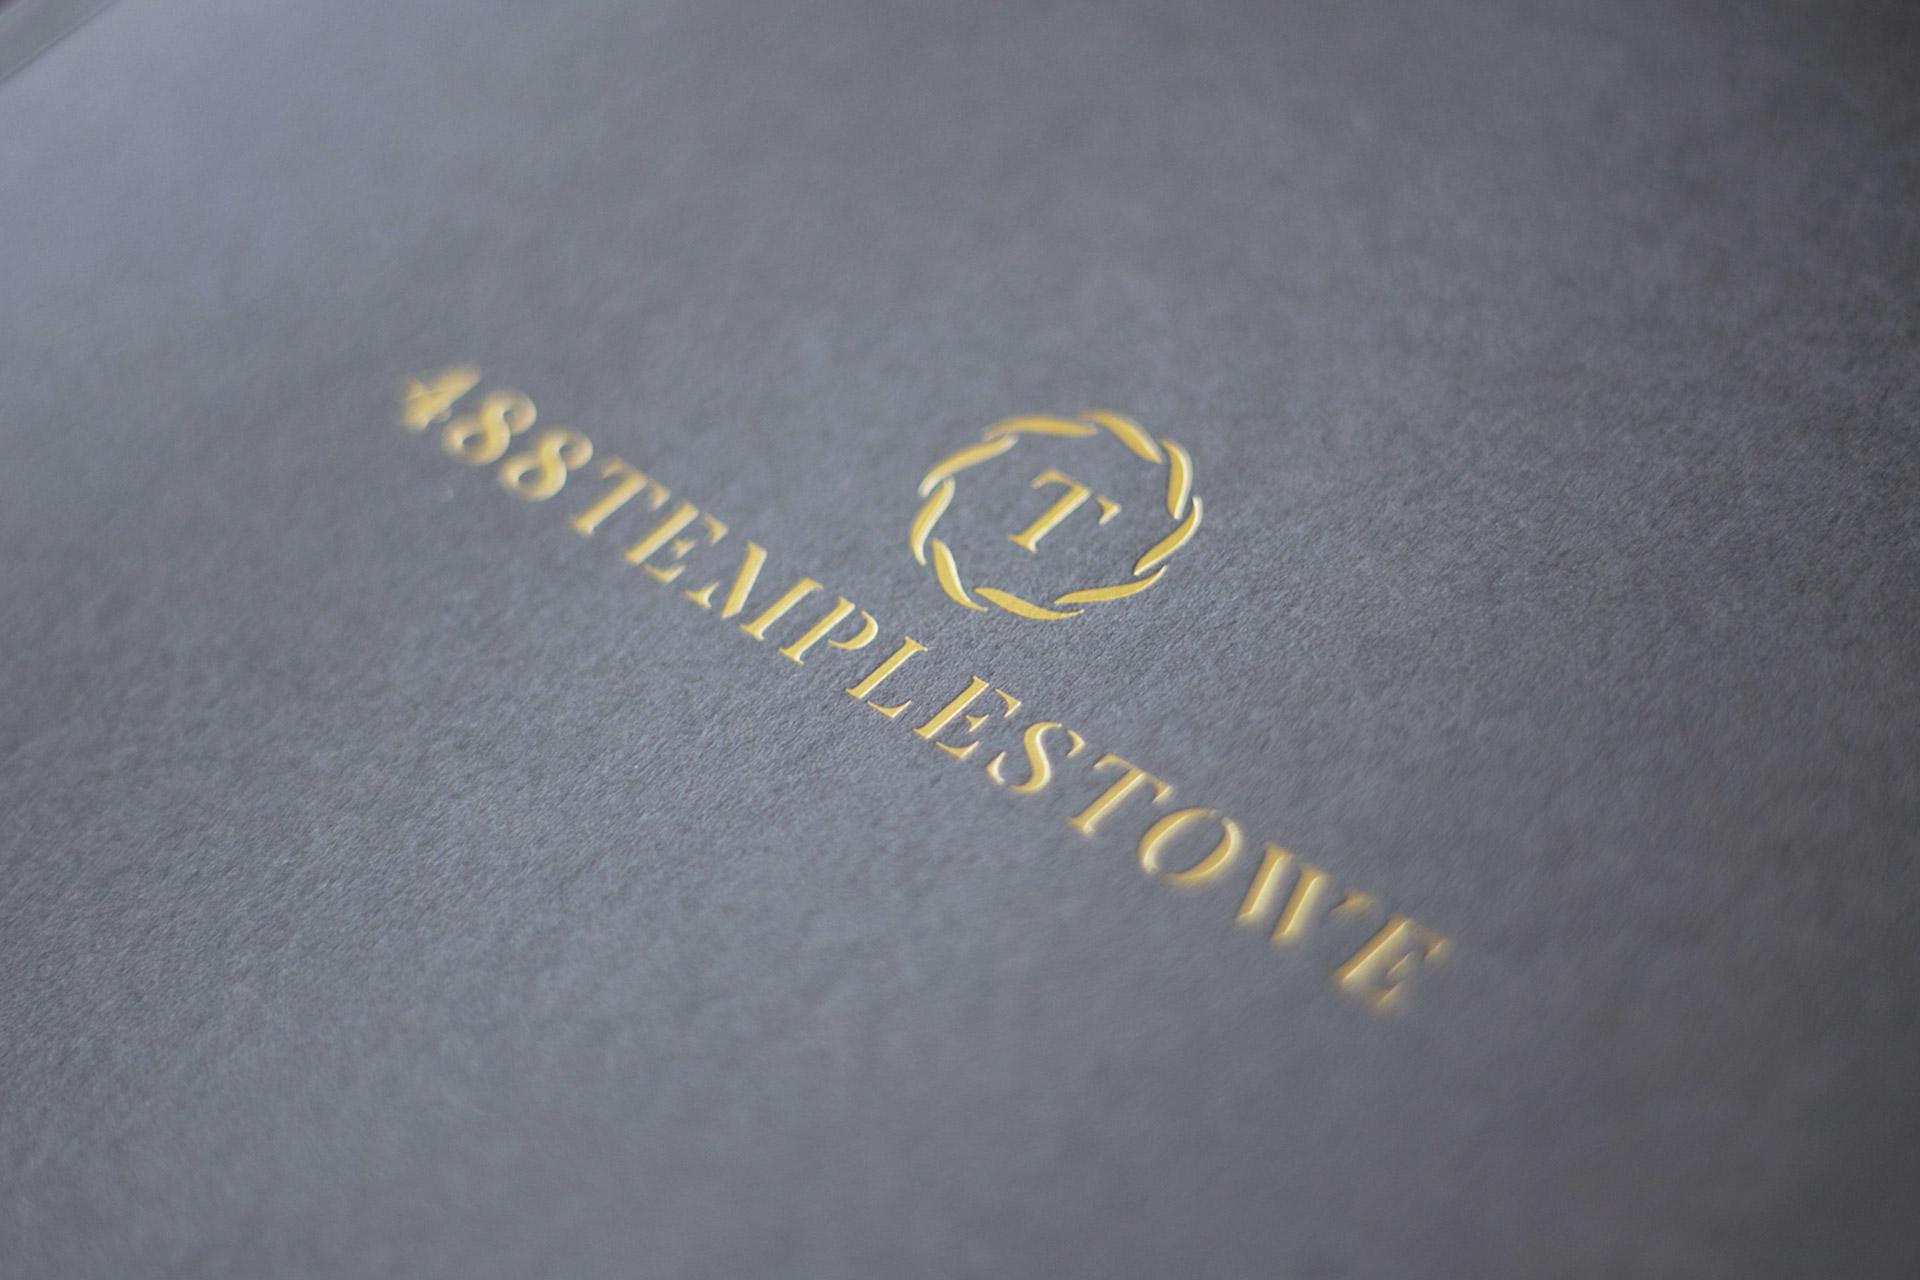 488 templestowe property branding by Z Creative Studio Branding & Graphic Design Melbourne